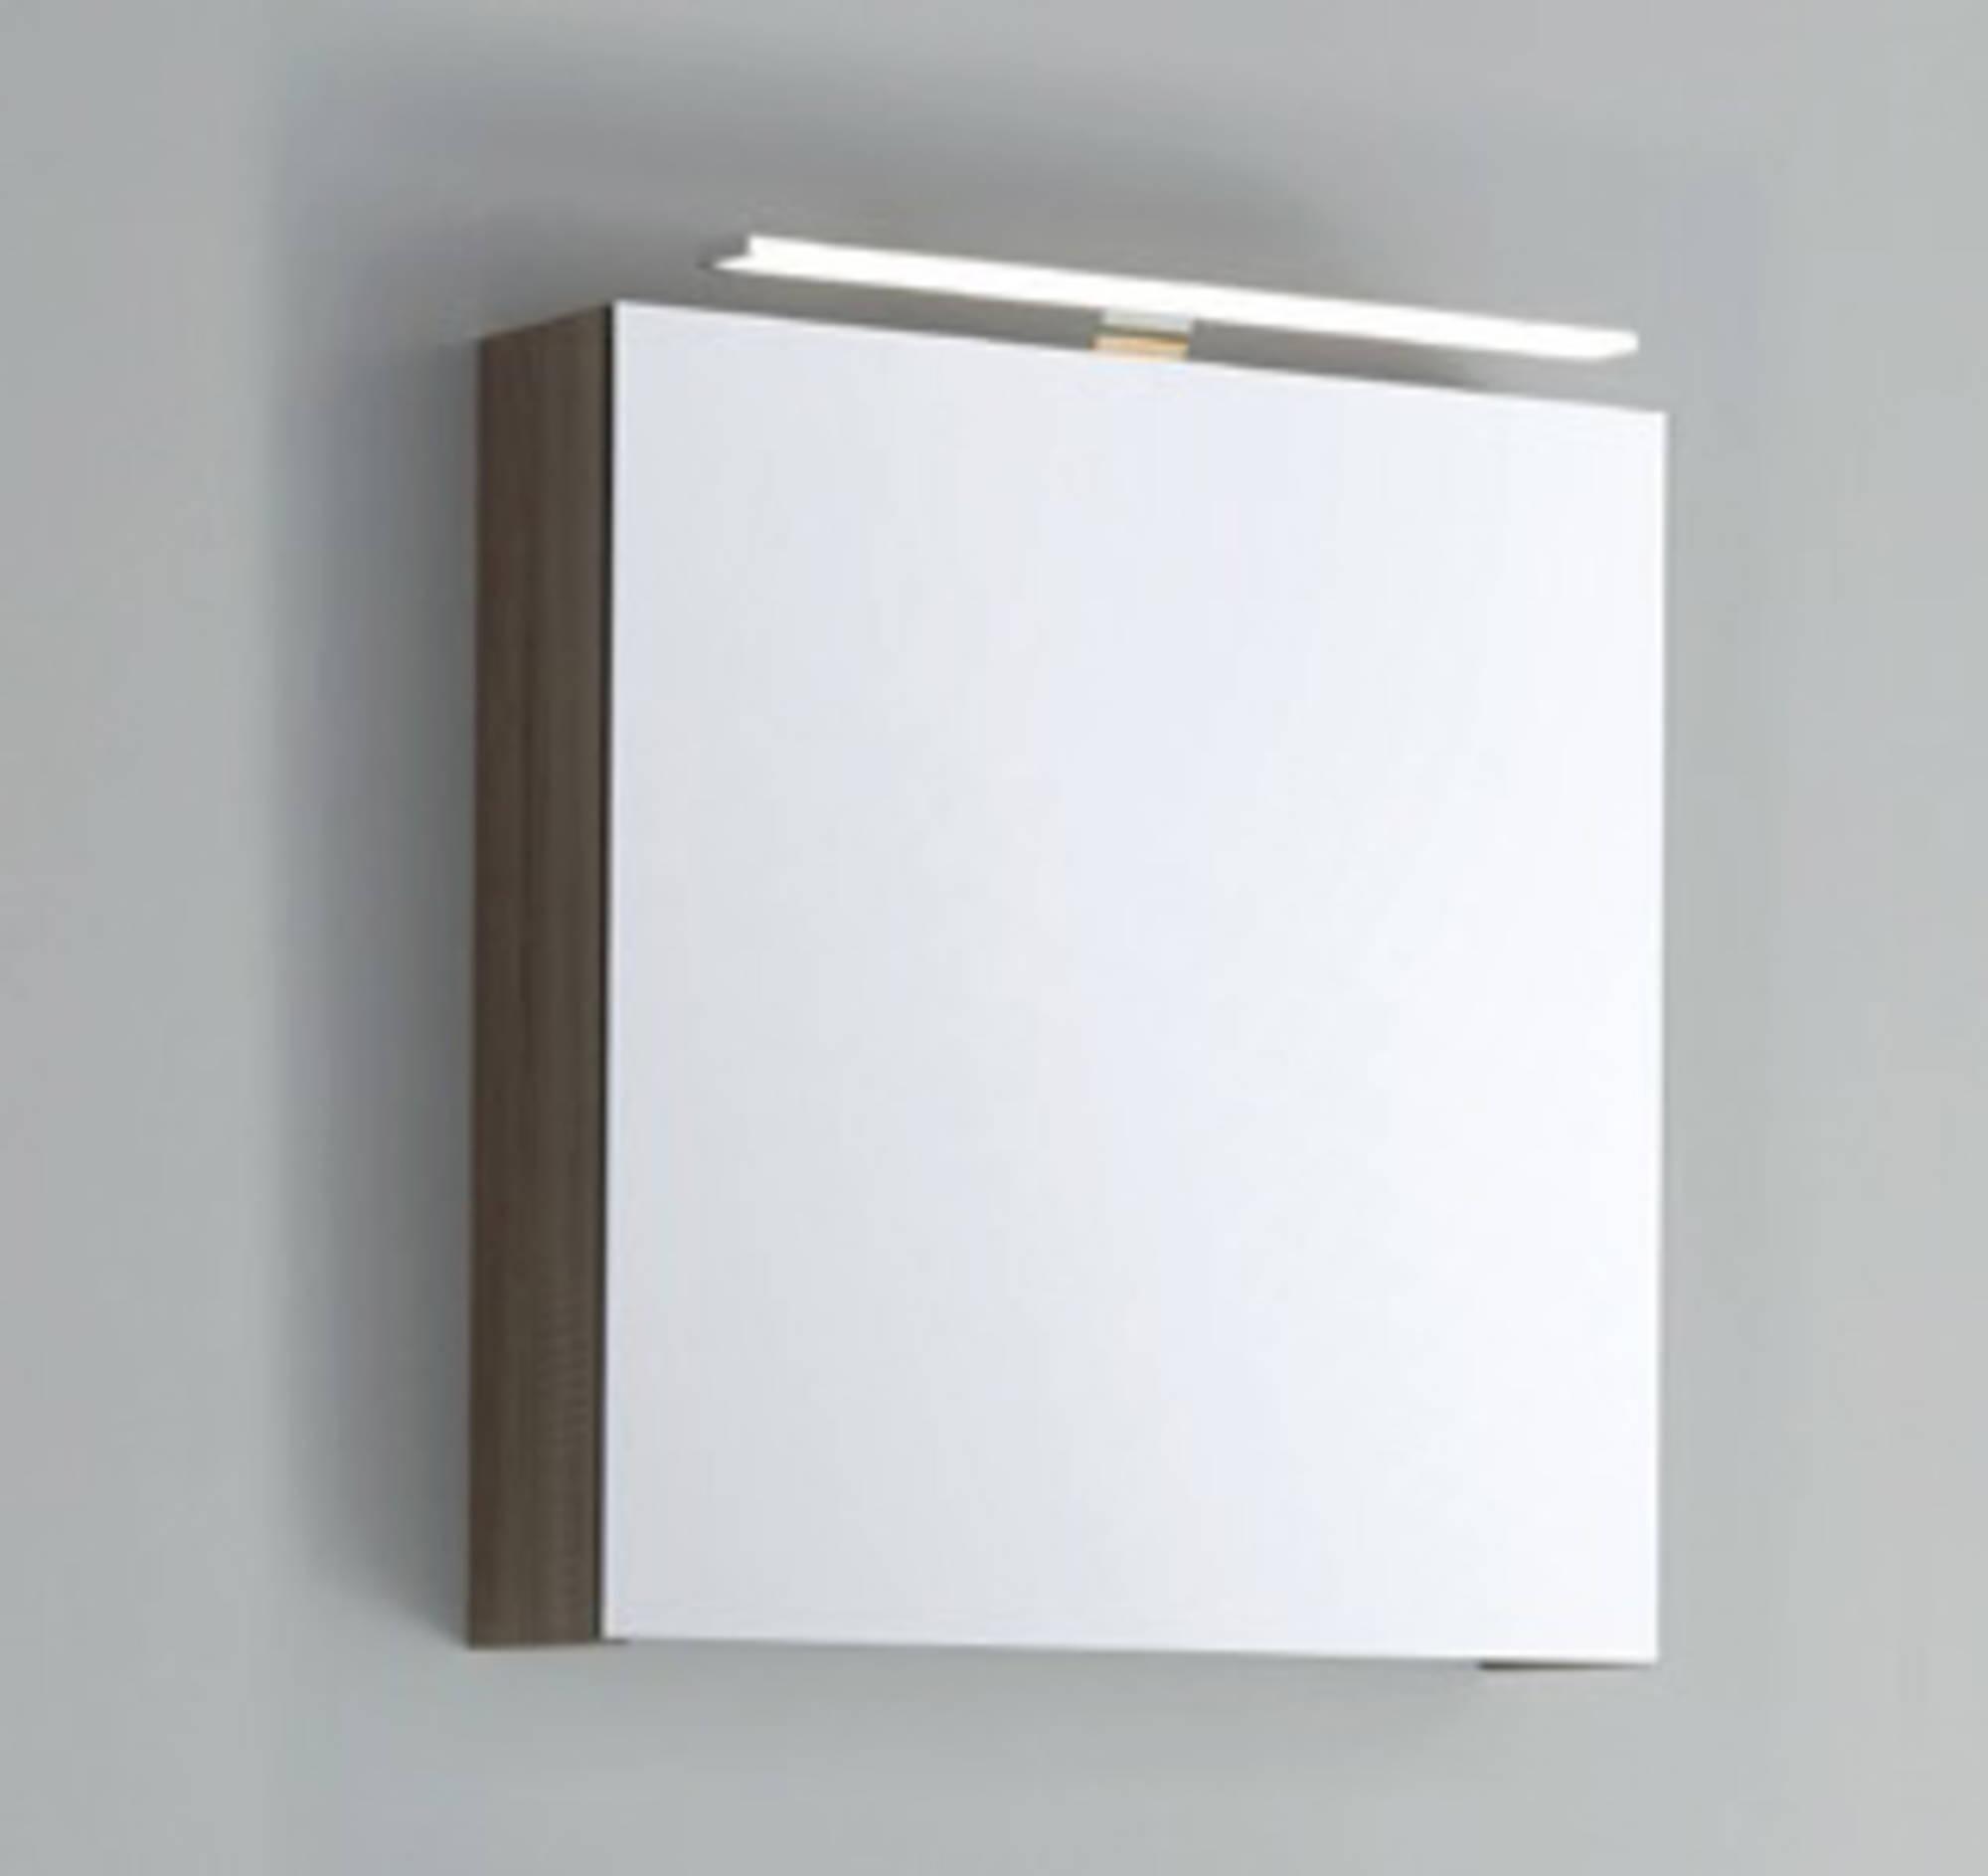 Line 45 Spiegelkast Rechtsdraaiend 60x13,5x60 cm excl. Verlichting Navarro Eiken